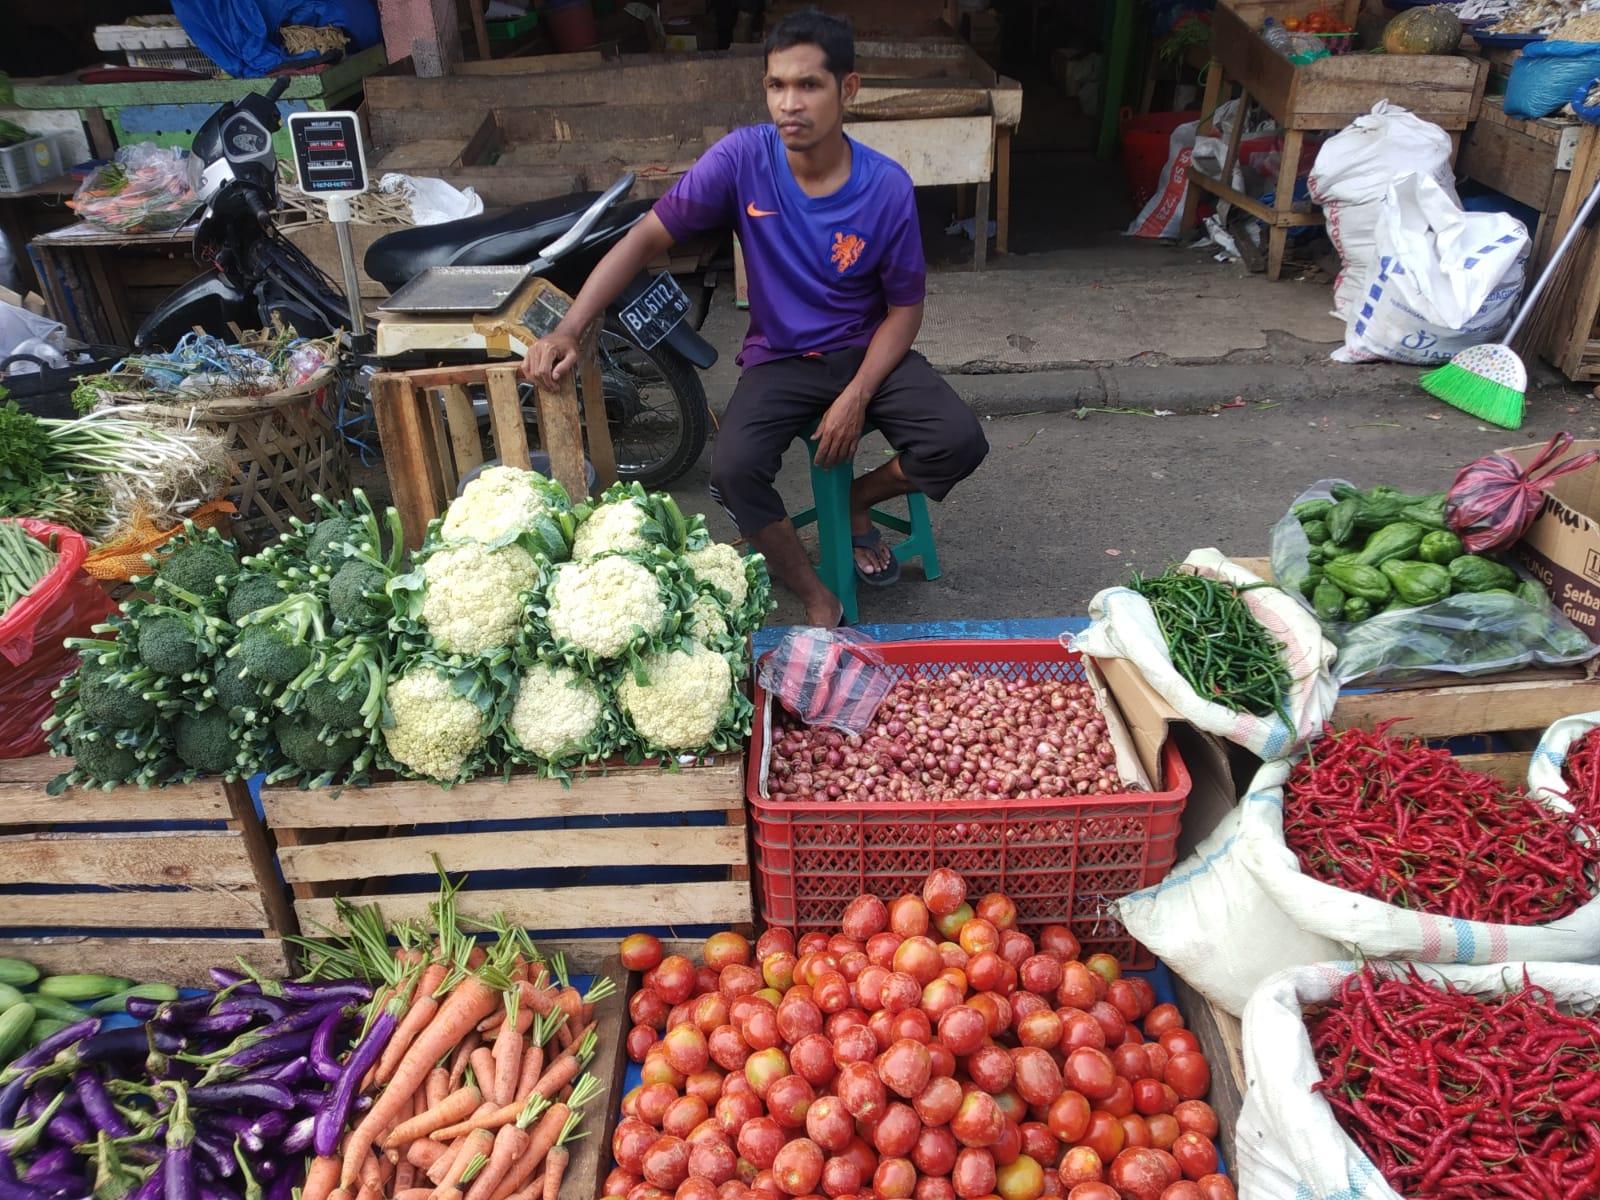 Harga Cabai dan Bawang Turun di Banda Aceh, Ini Respon Pedagang